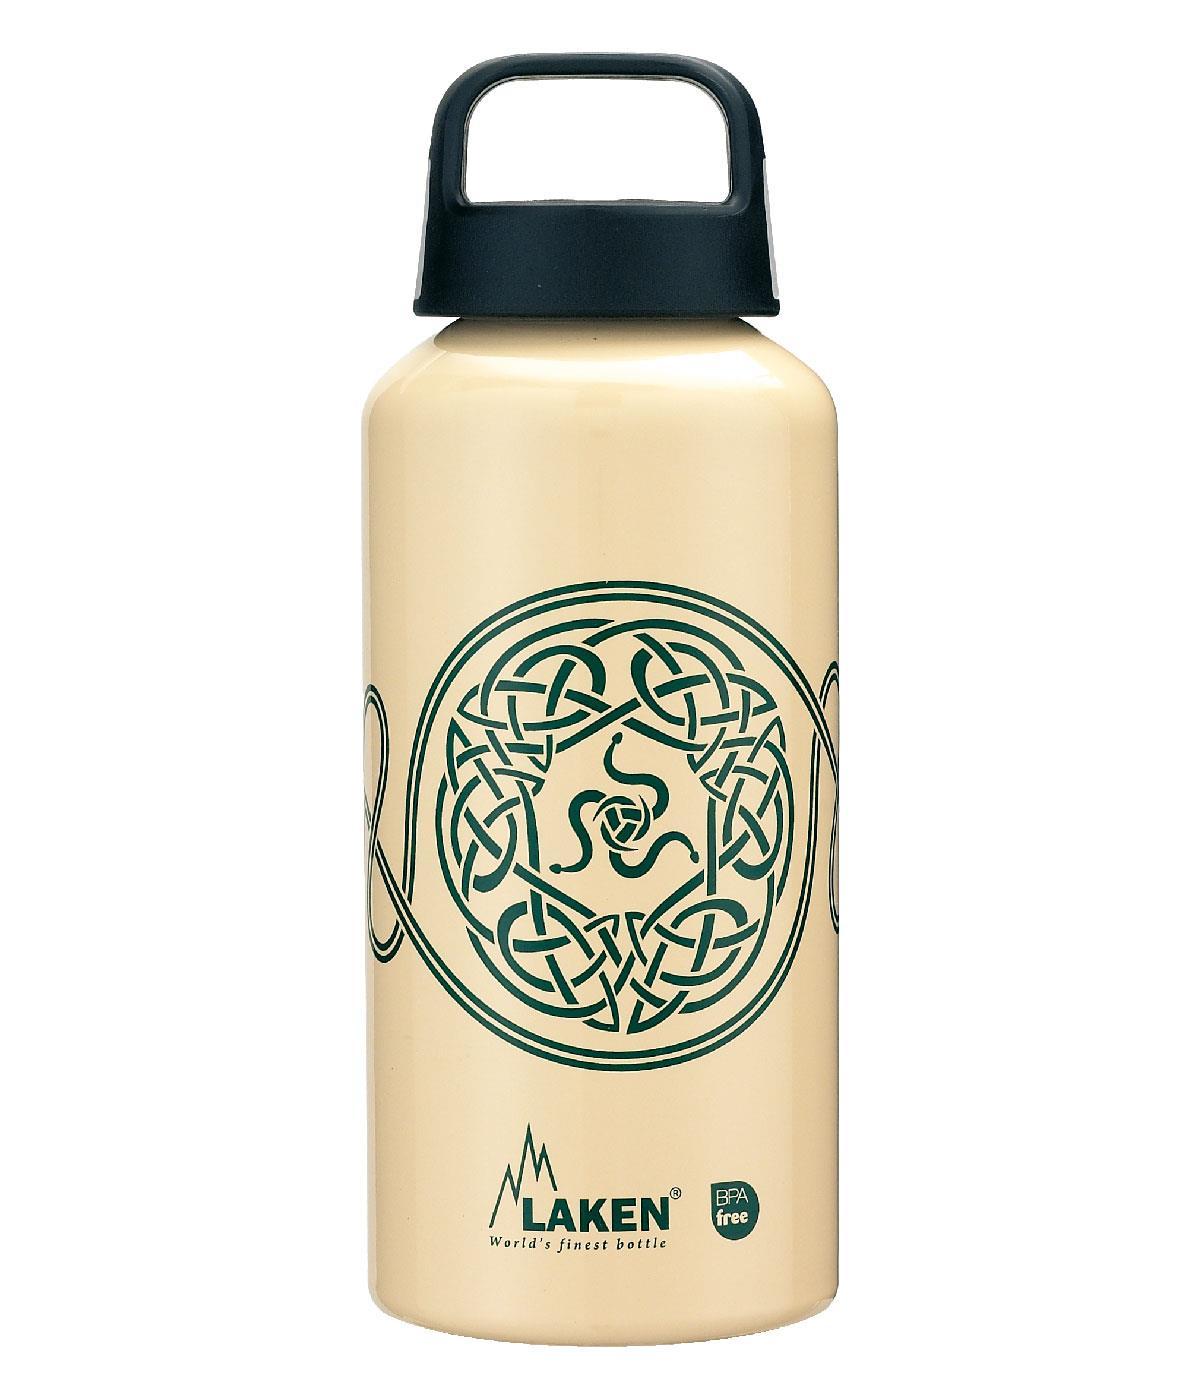 Laken Alüminyum Moebisuss Celtic 0,60Lt Matara Lkmo3101